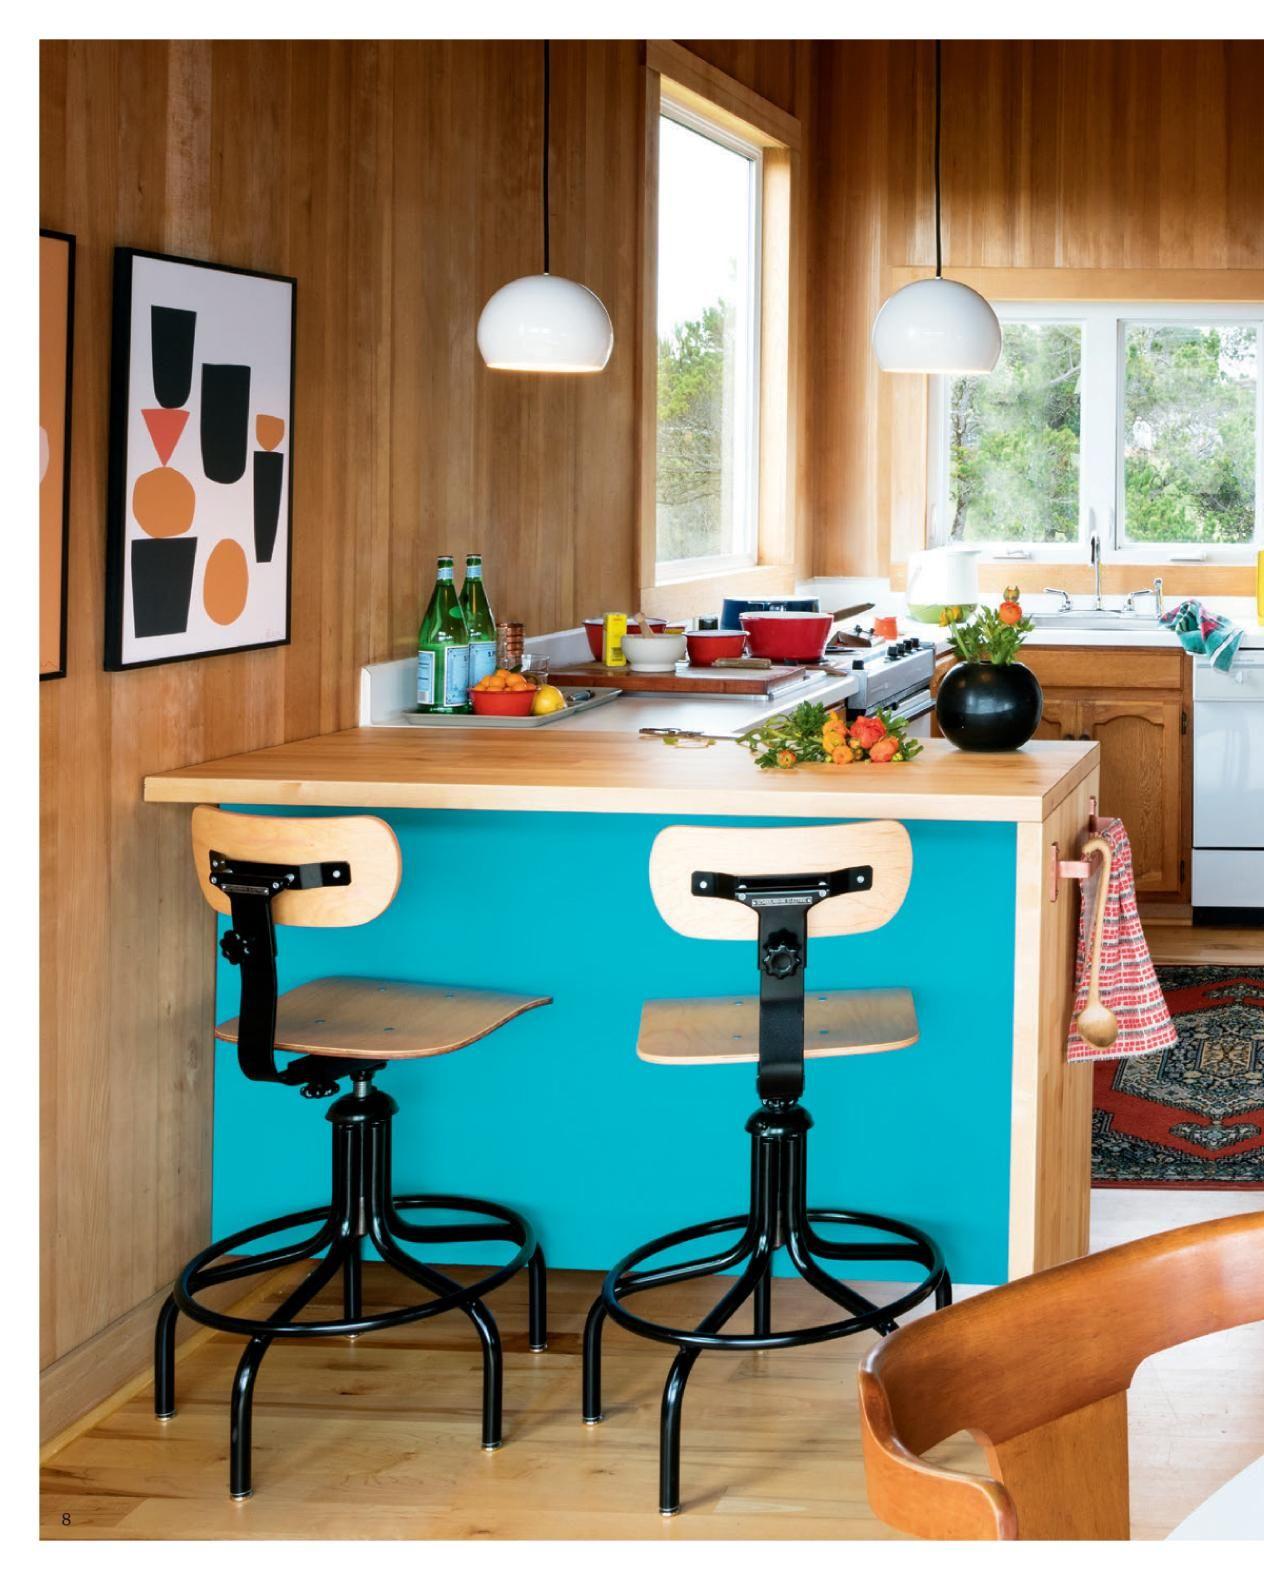 Schoolhouse Electric Catalogs | Inside Outside | Pinterest ...